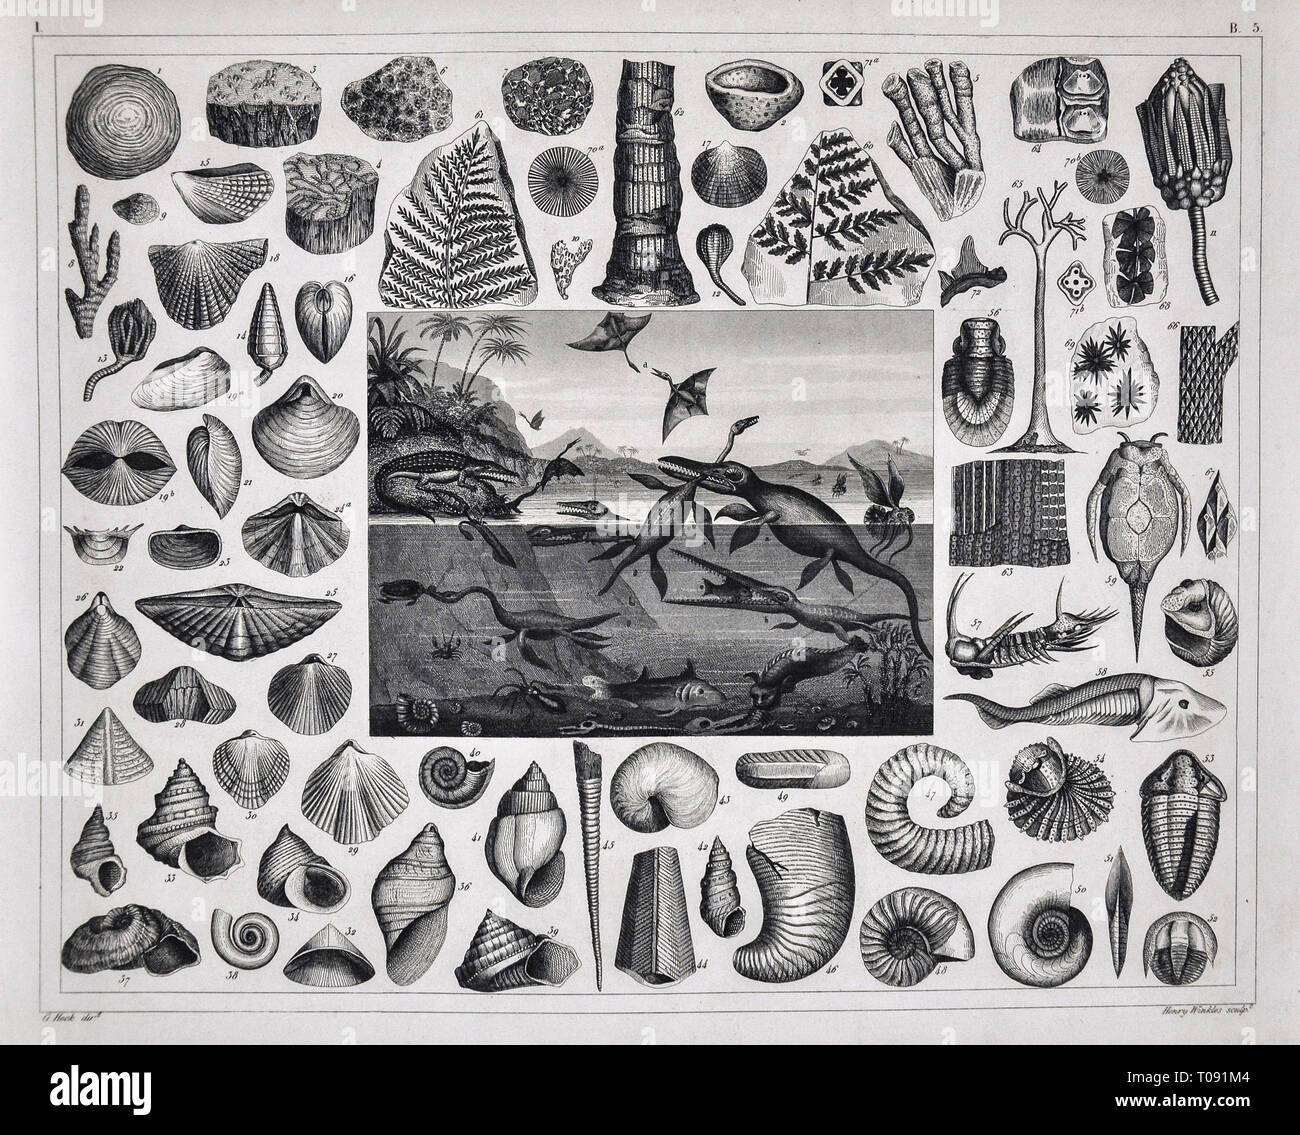 Pterodactyl Stock Photos & Pterodactyl Stock Images - Alamy